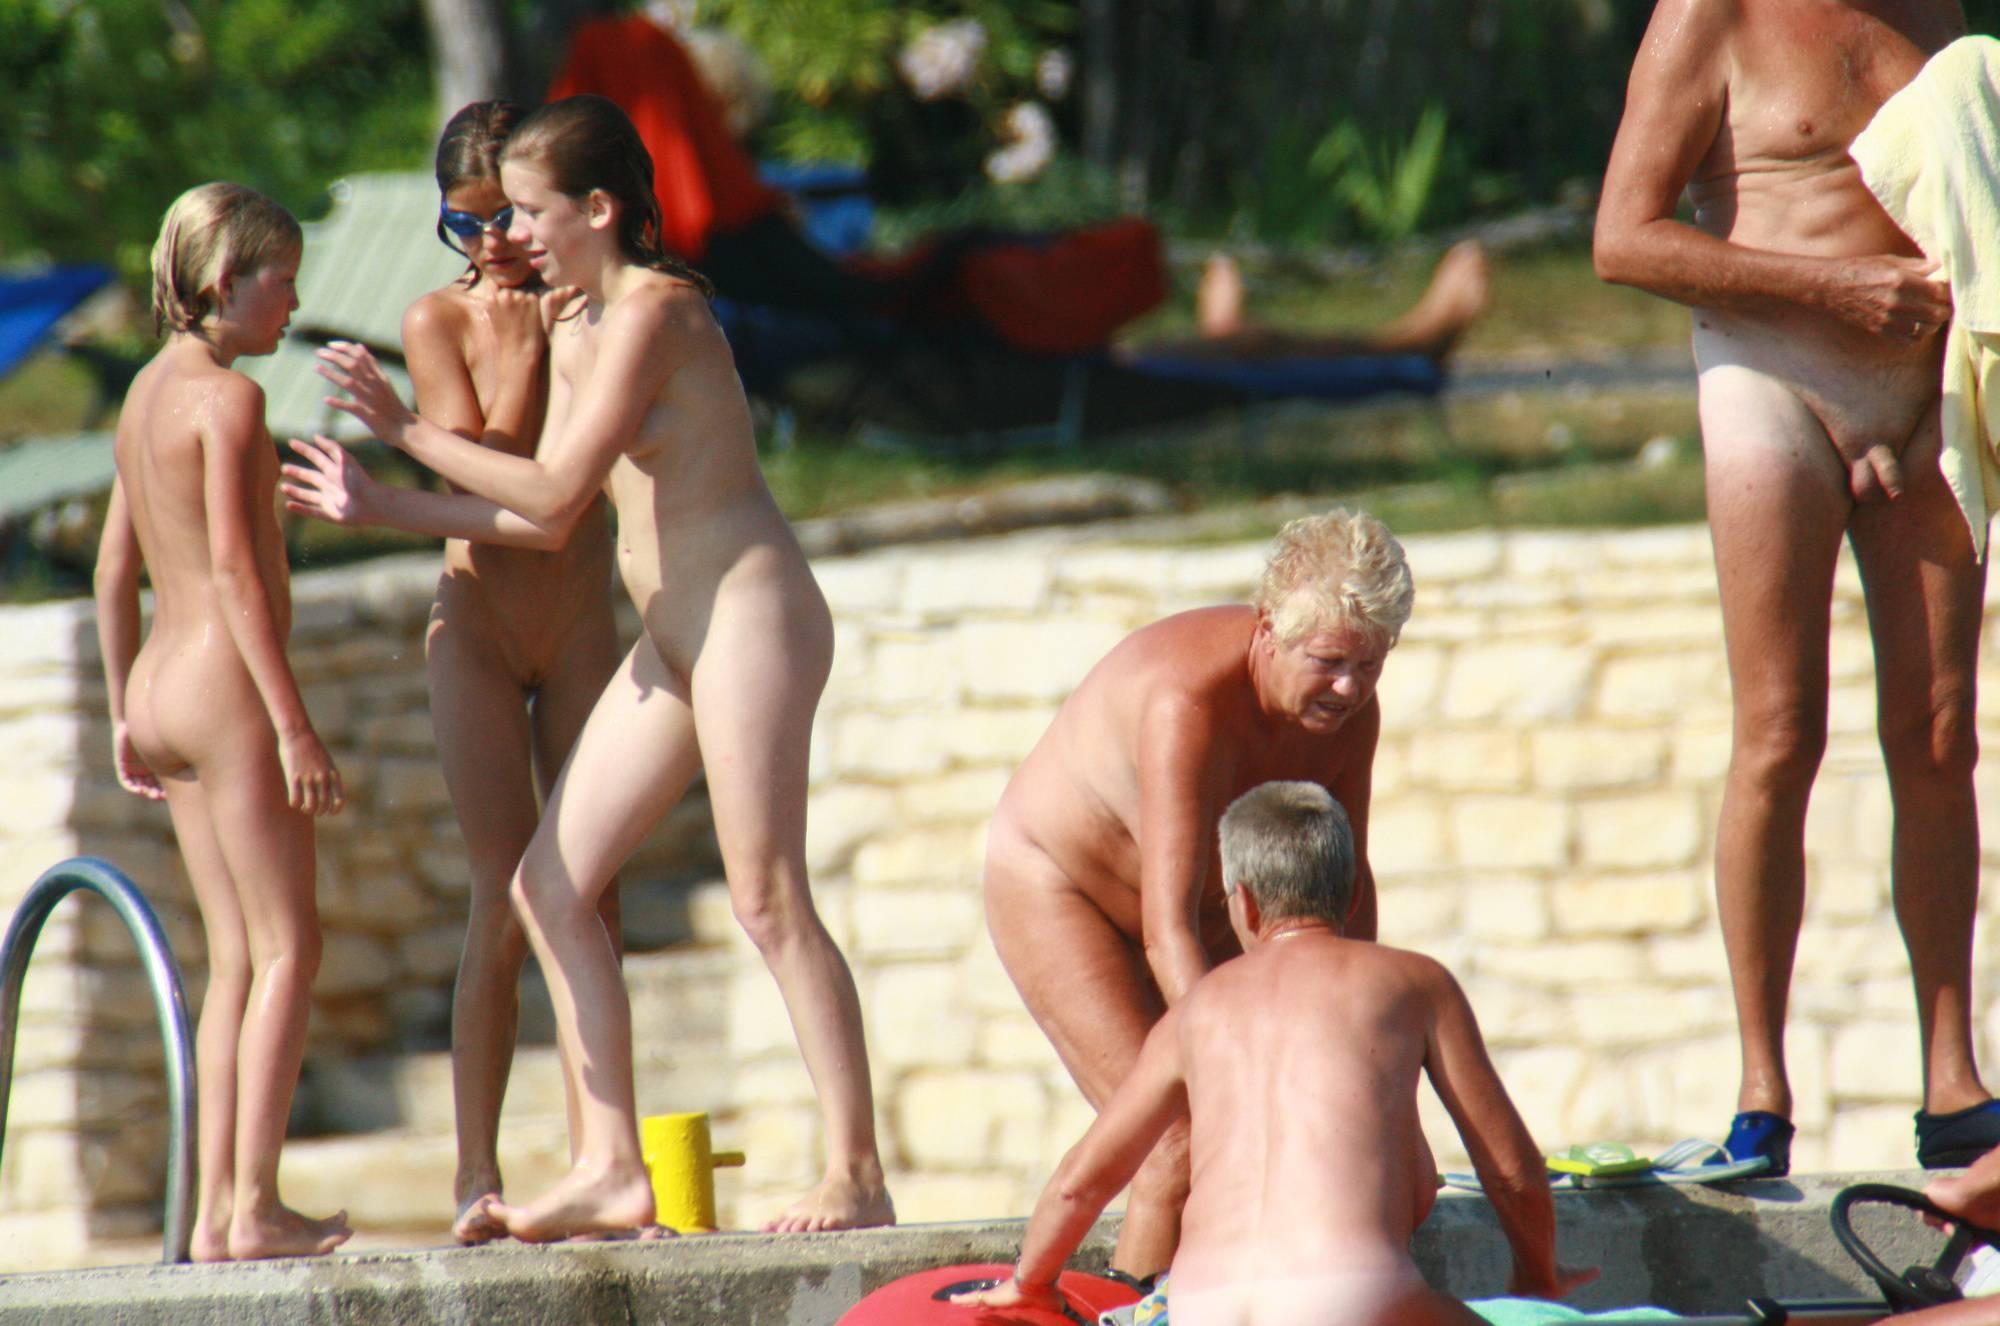 Nudist Pics Girls Group Run and Splash - 1